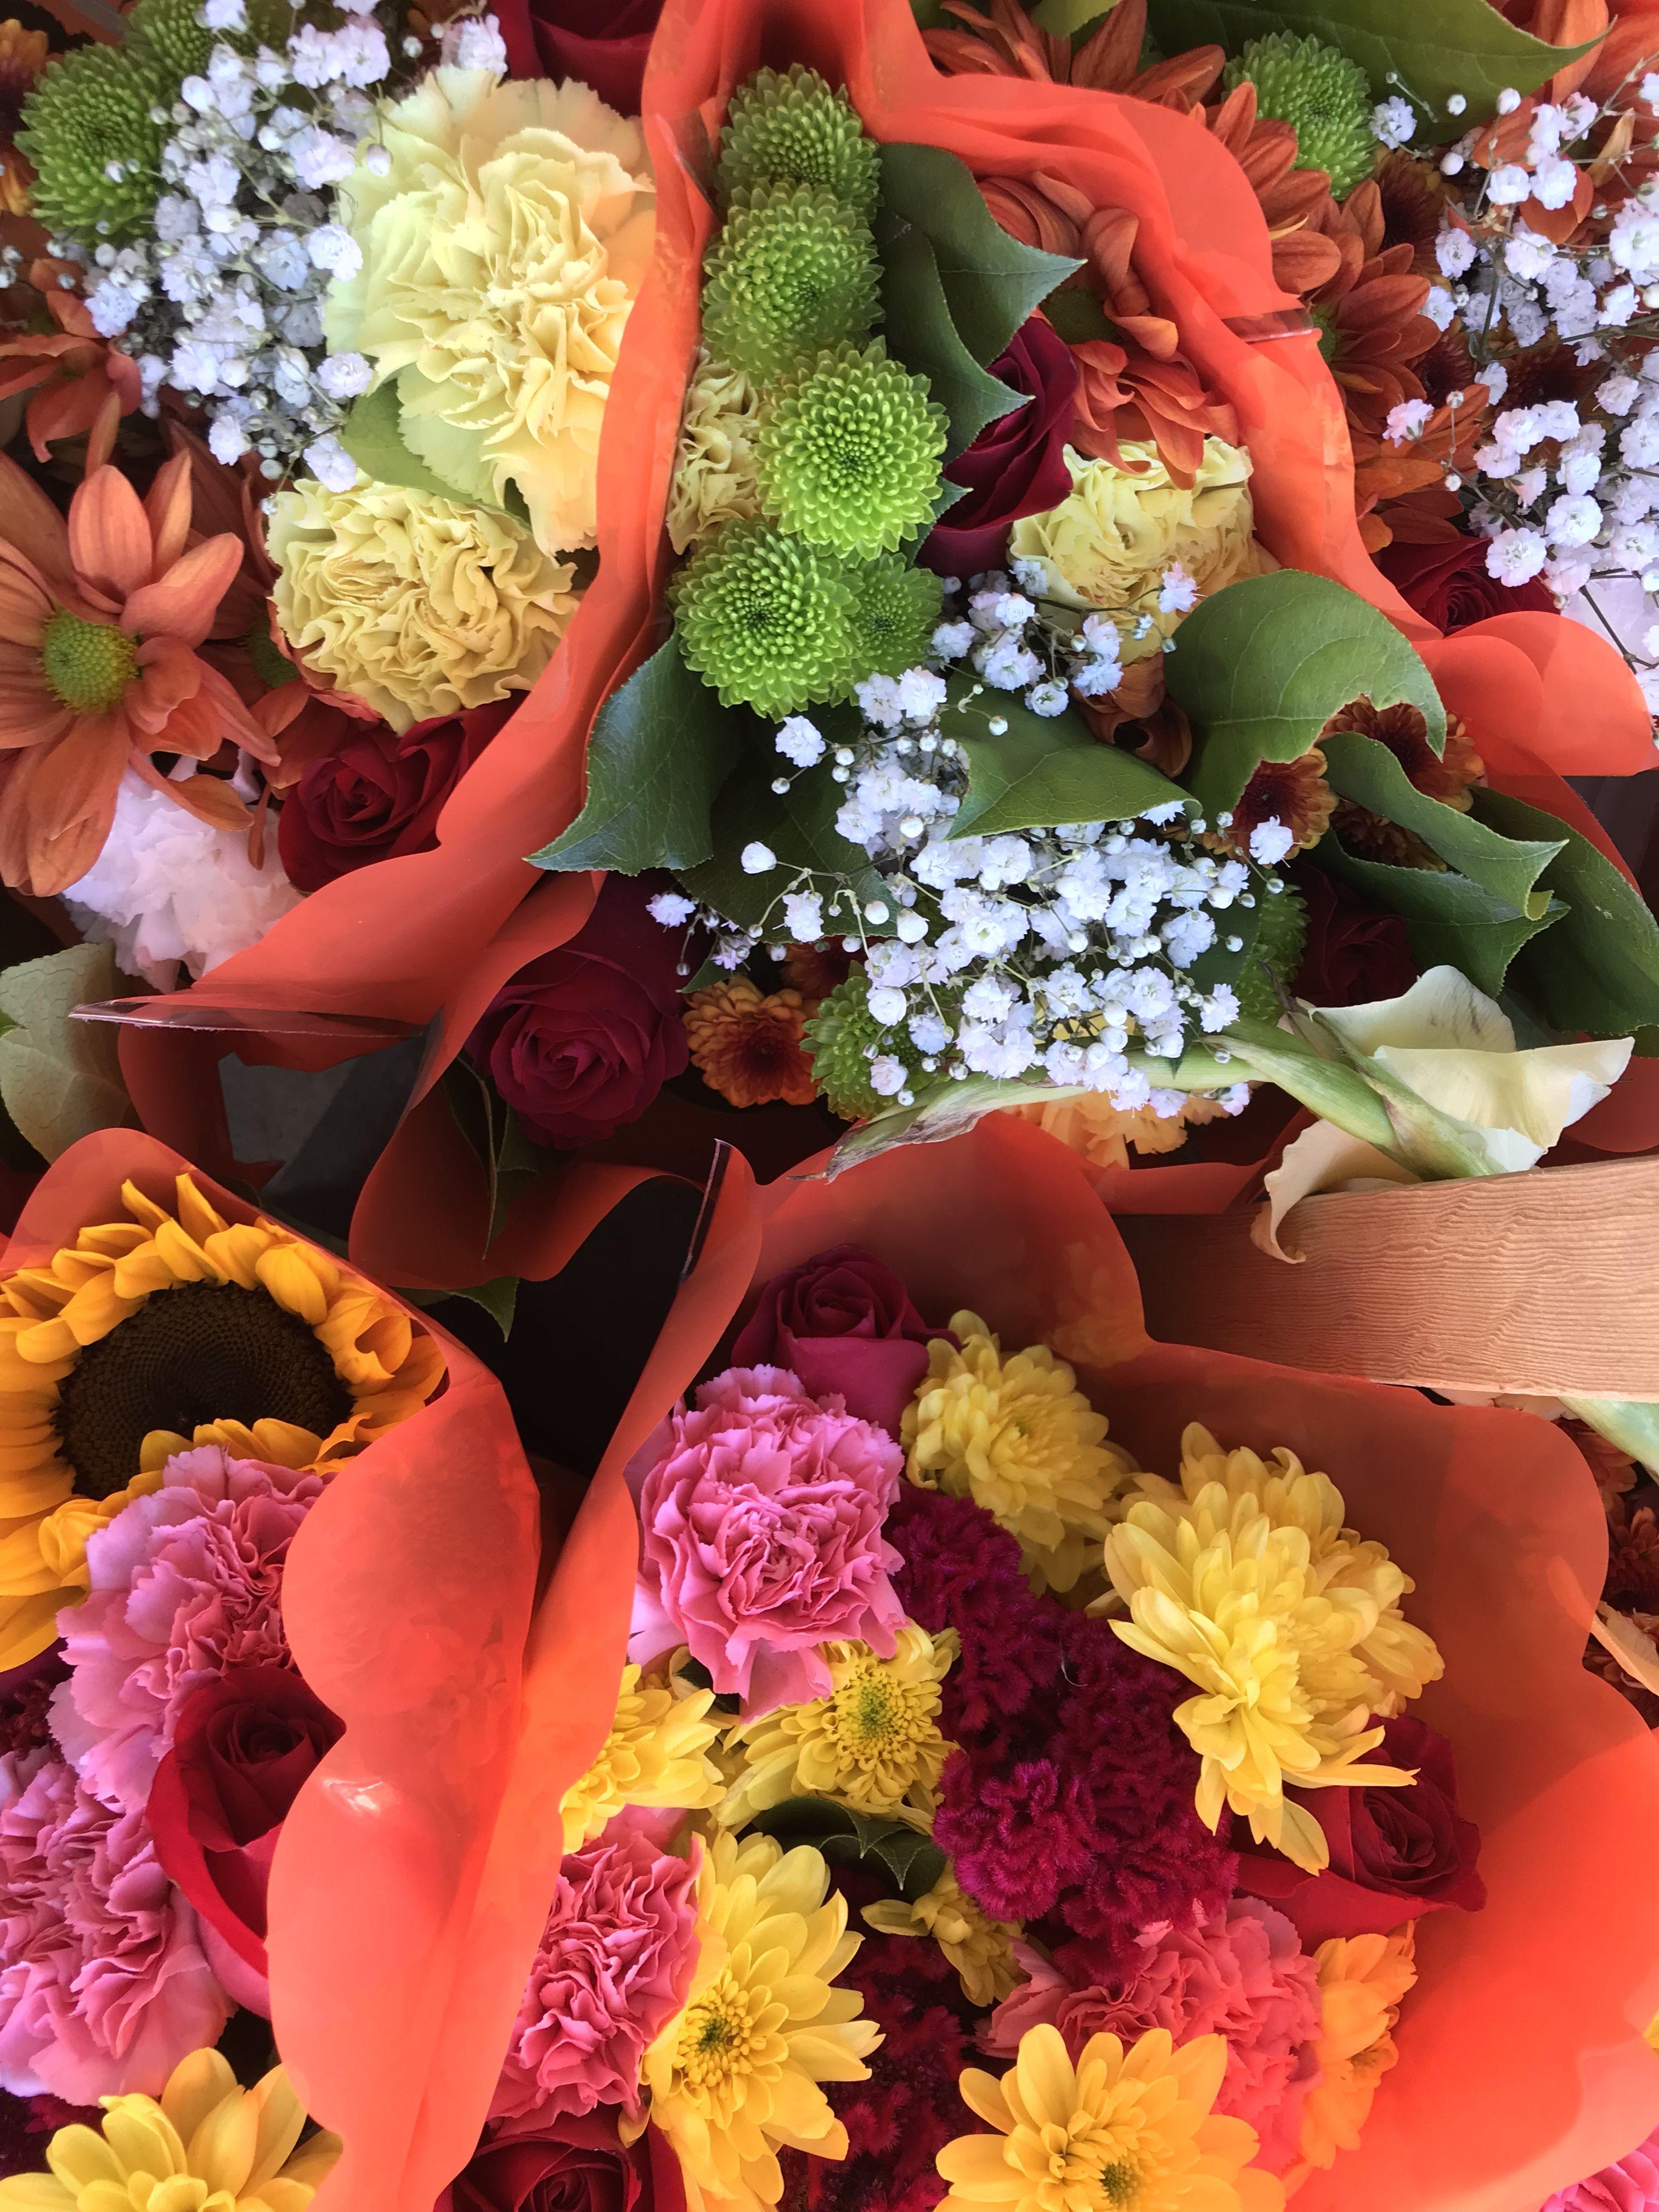 los angeles flower market hours